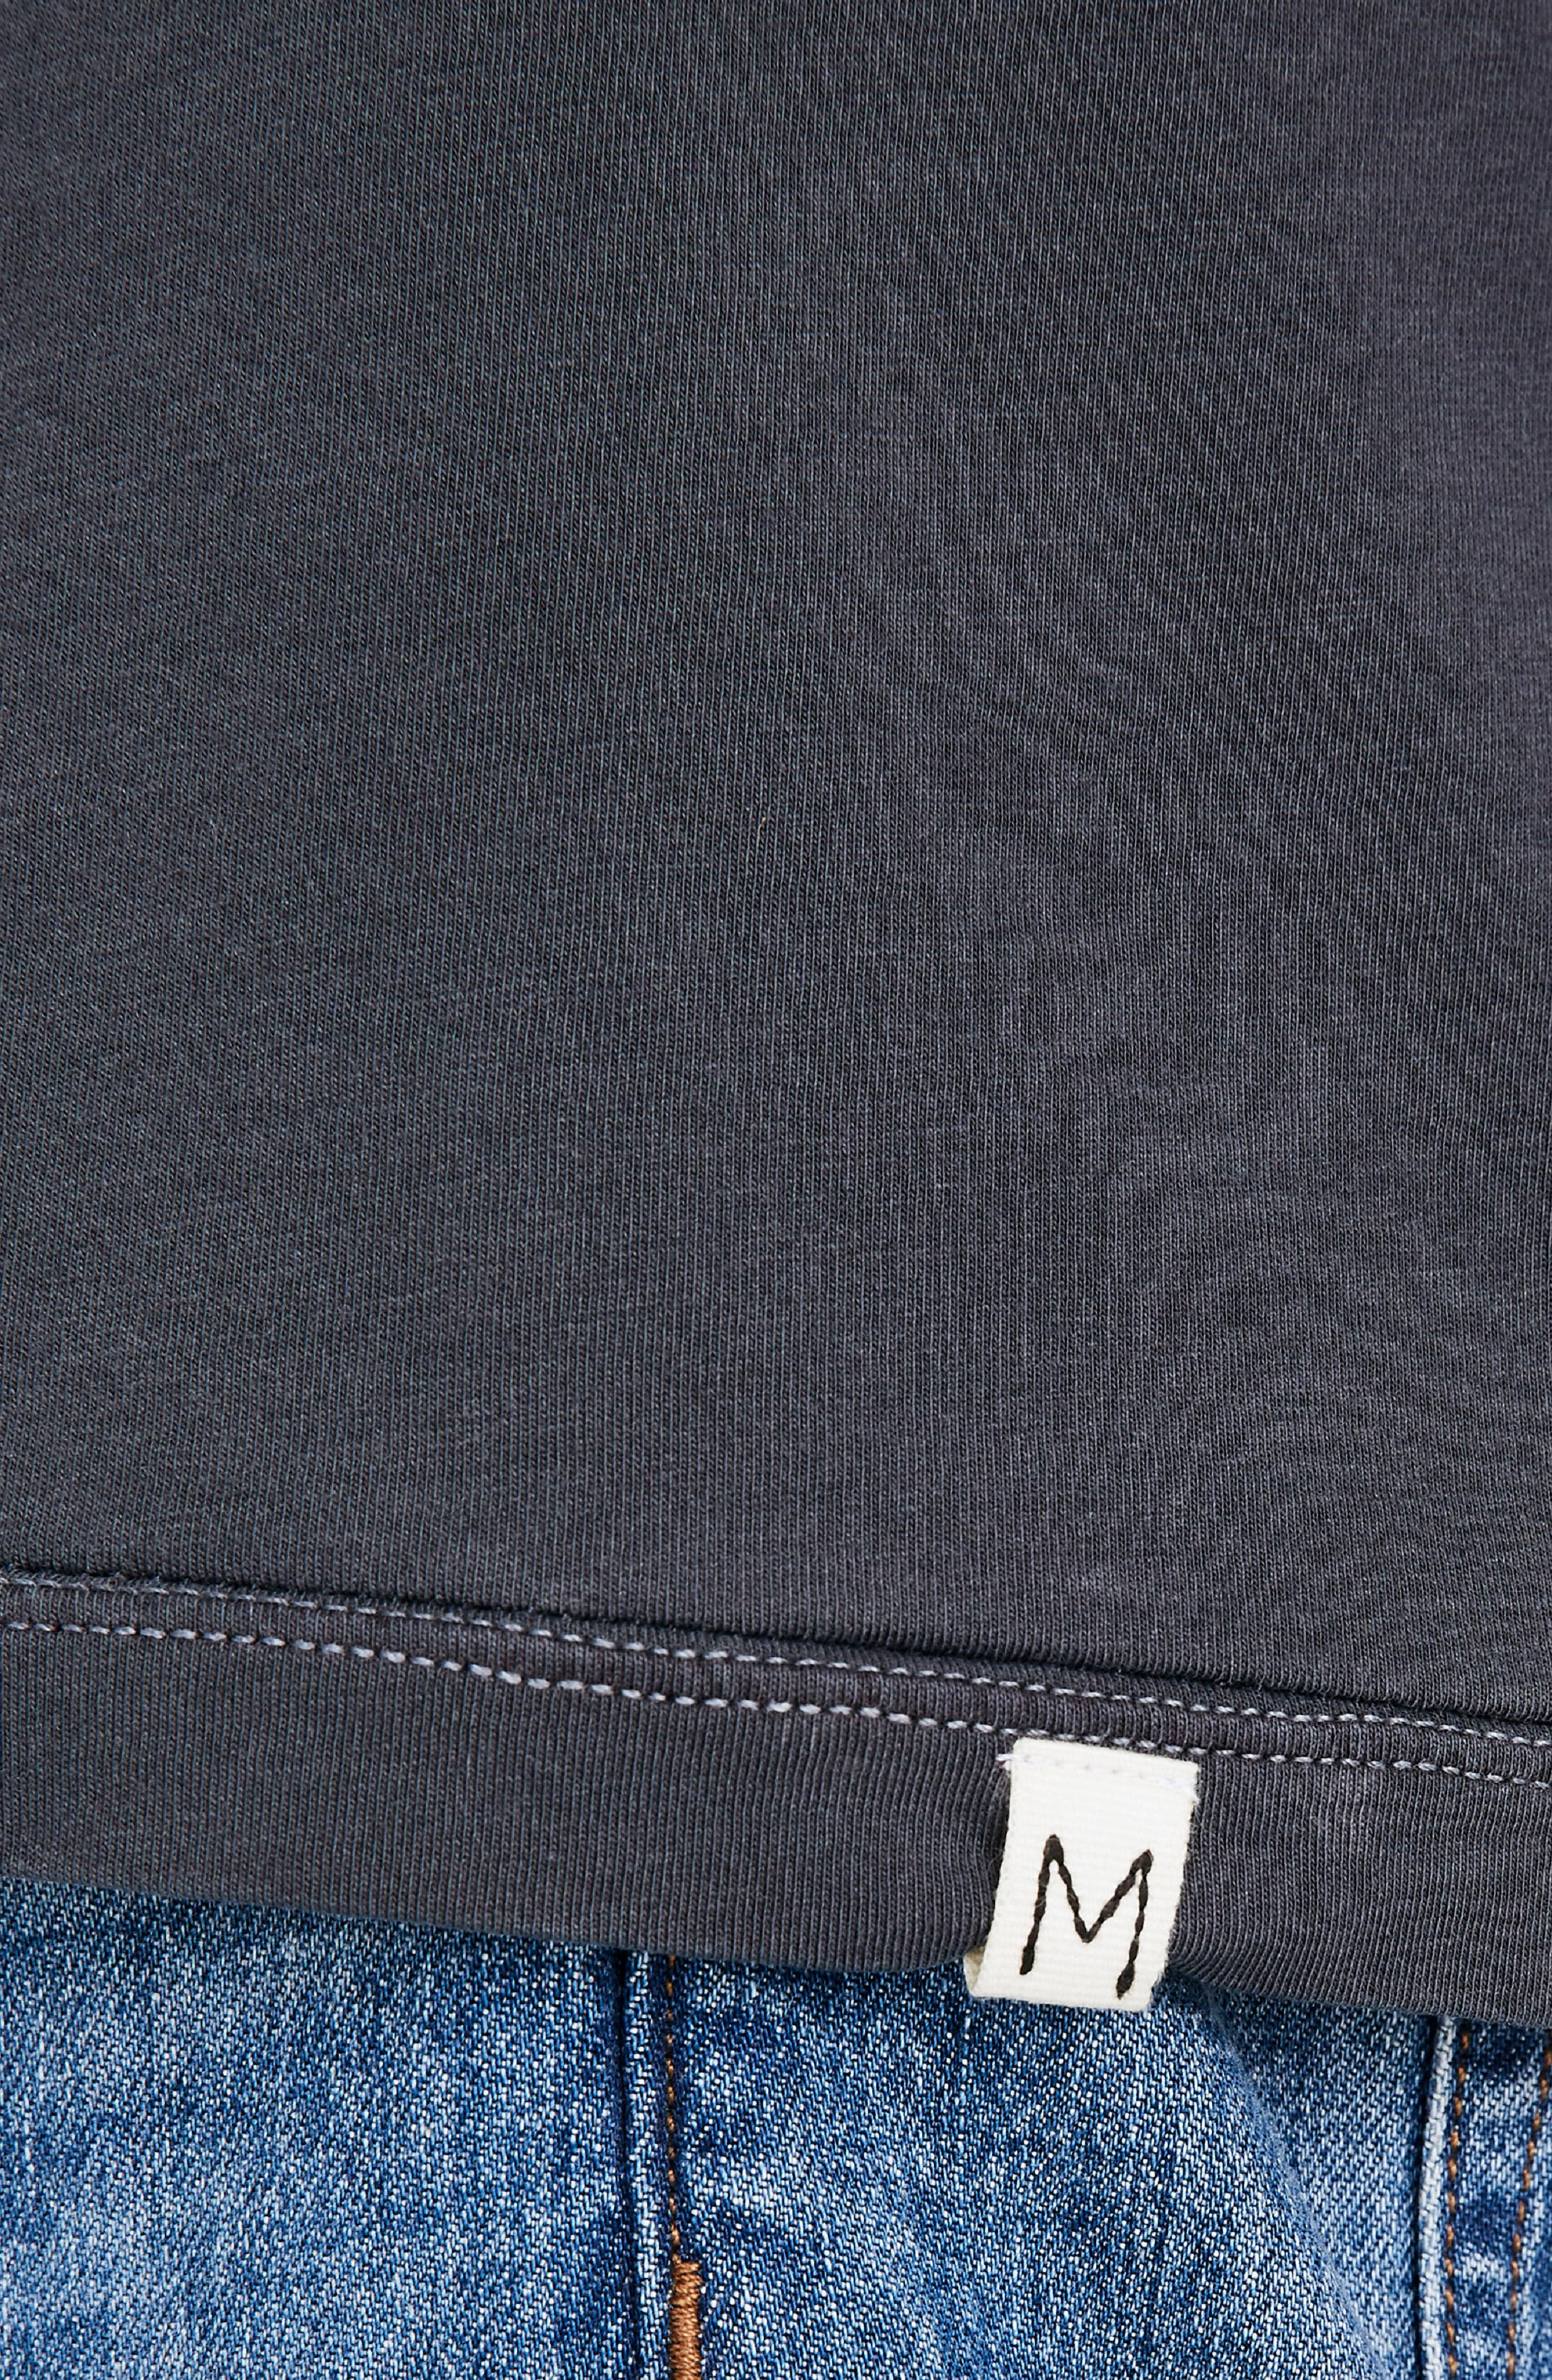 Long Sleeve Slim T-Shirt,                             Alternate thumbnail 2, color,                             CLASSIC BLACK